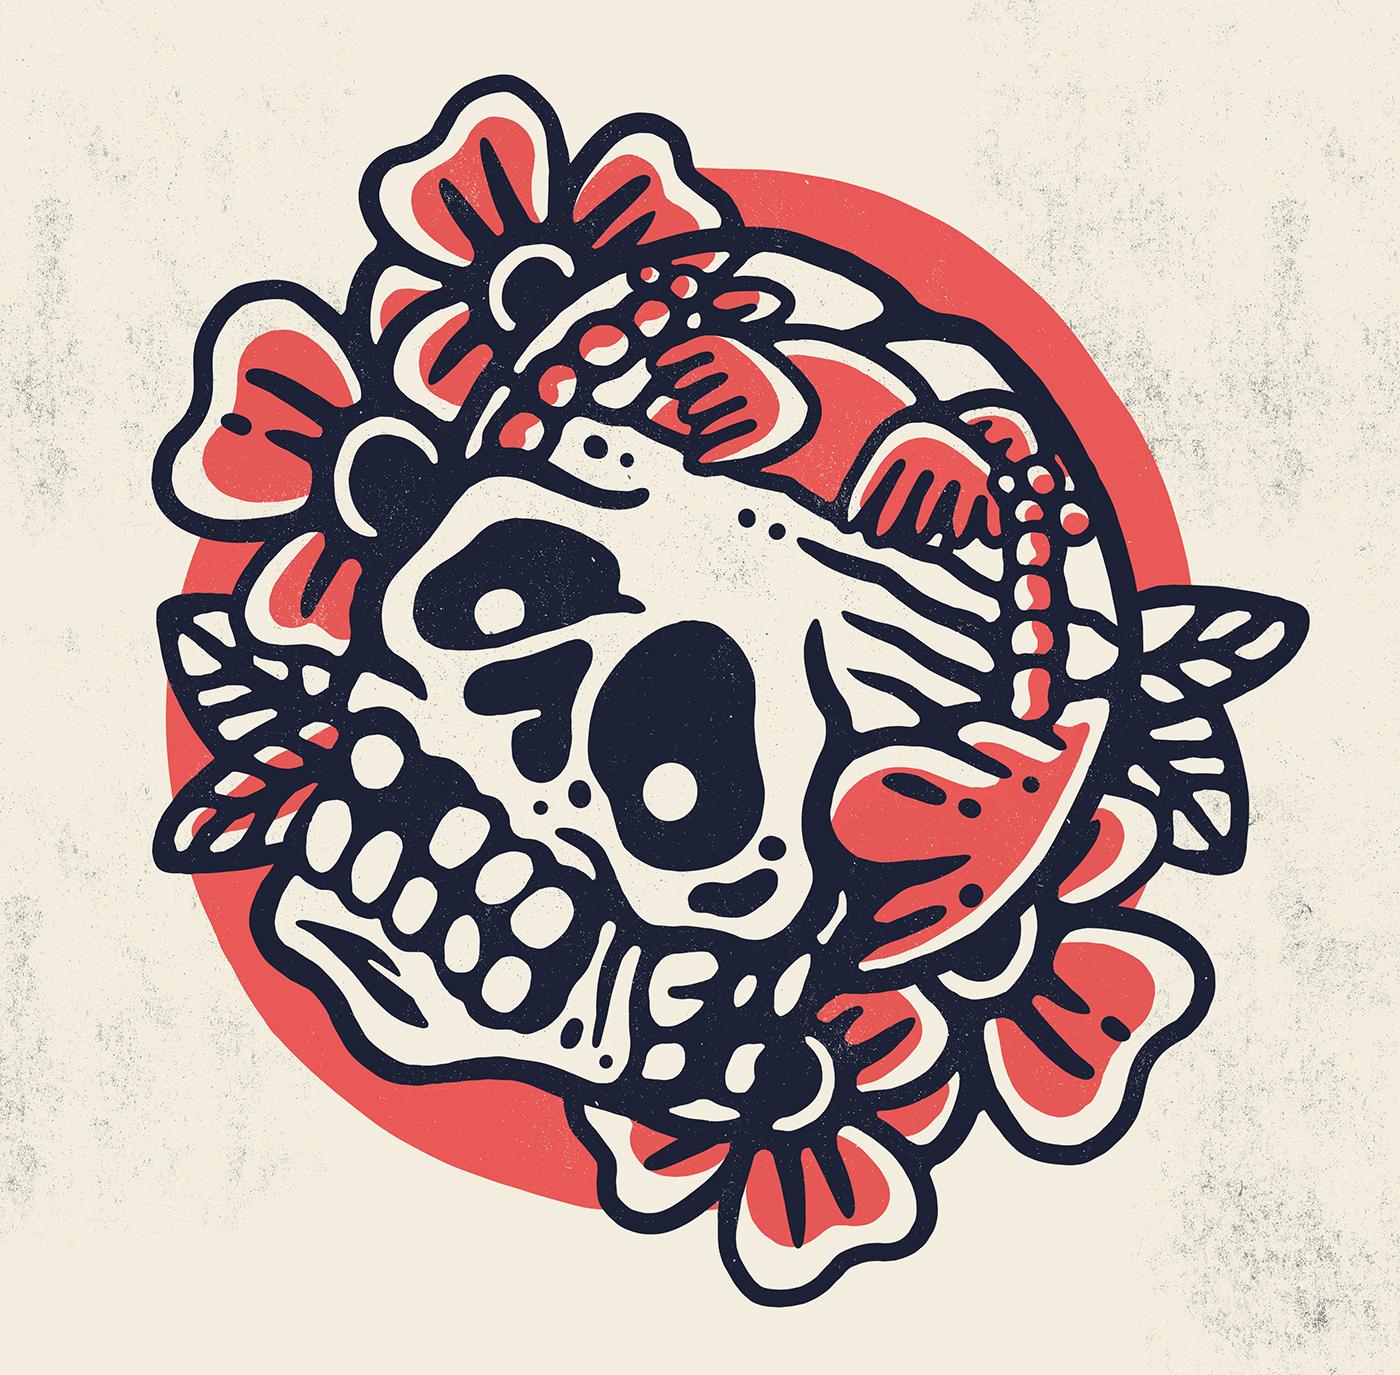 punk,music,texture,design,artwork,Merch,band,lifestyle,brand,apparel